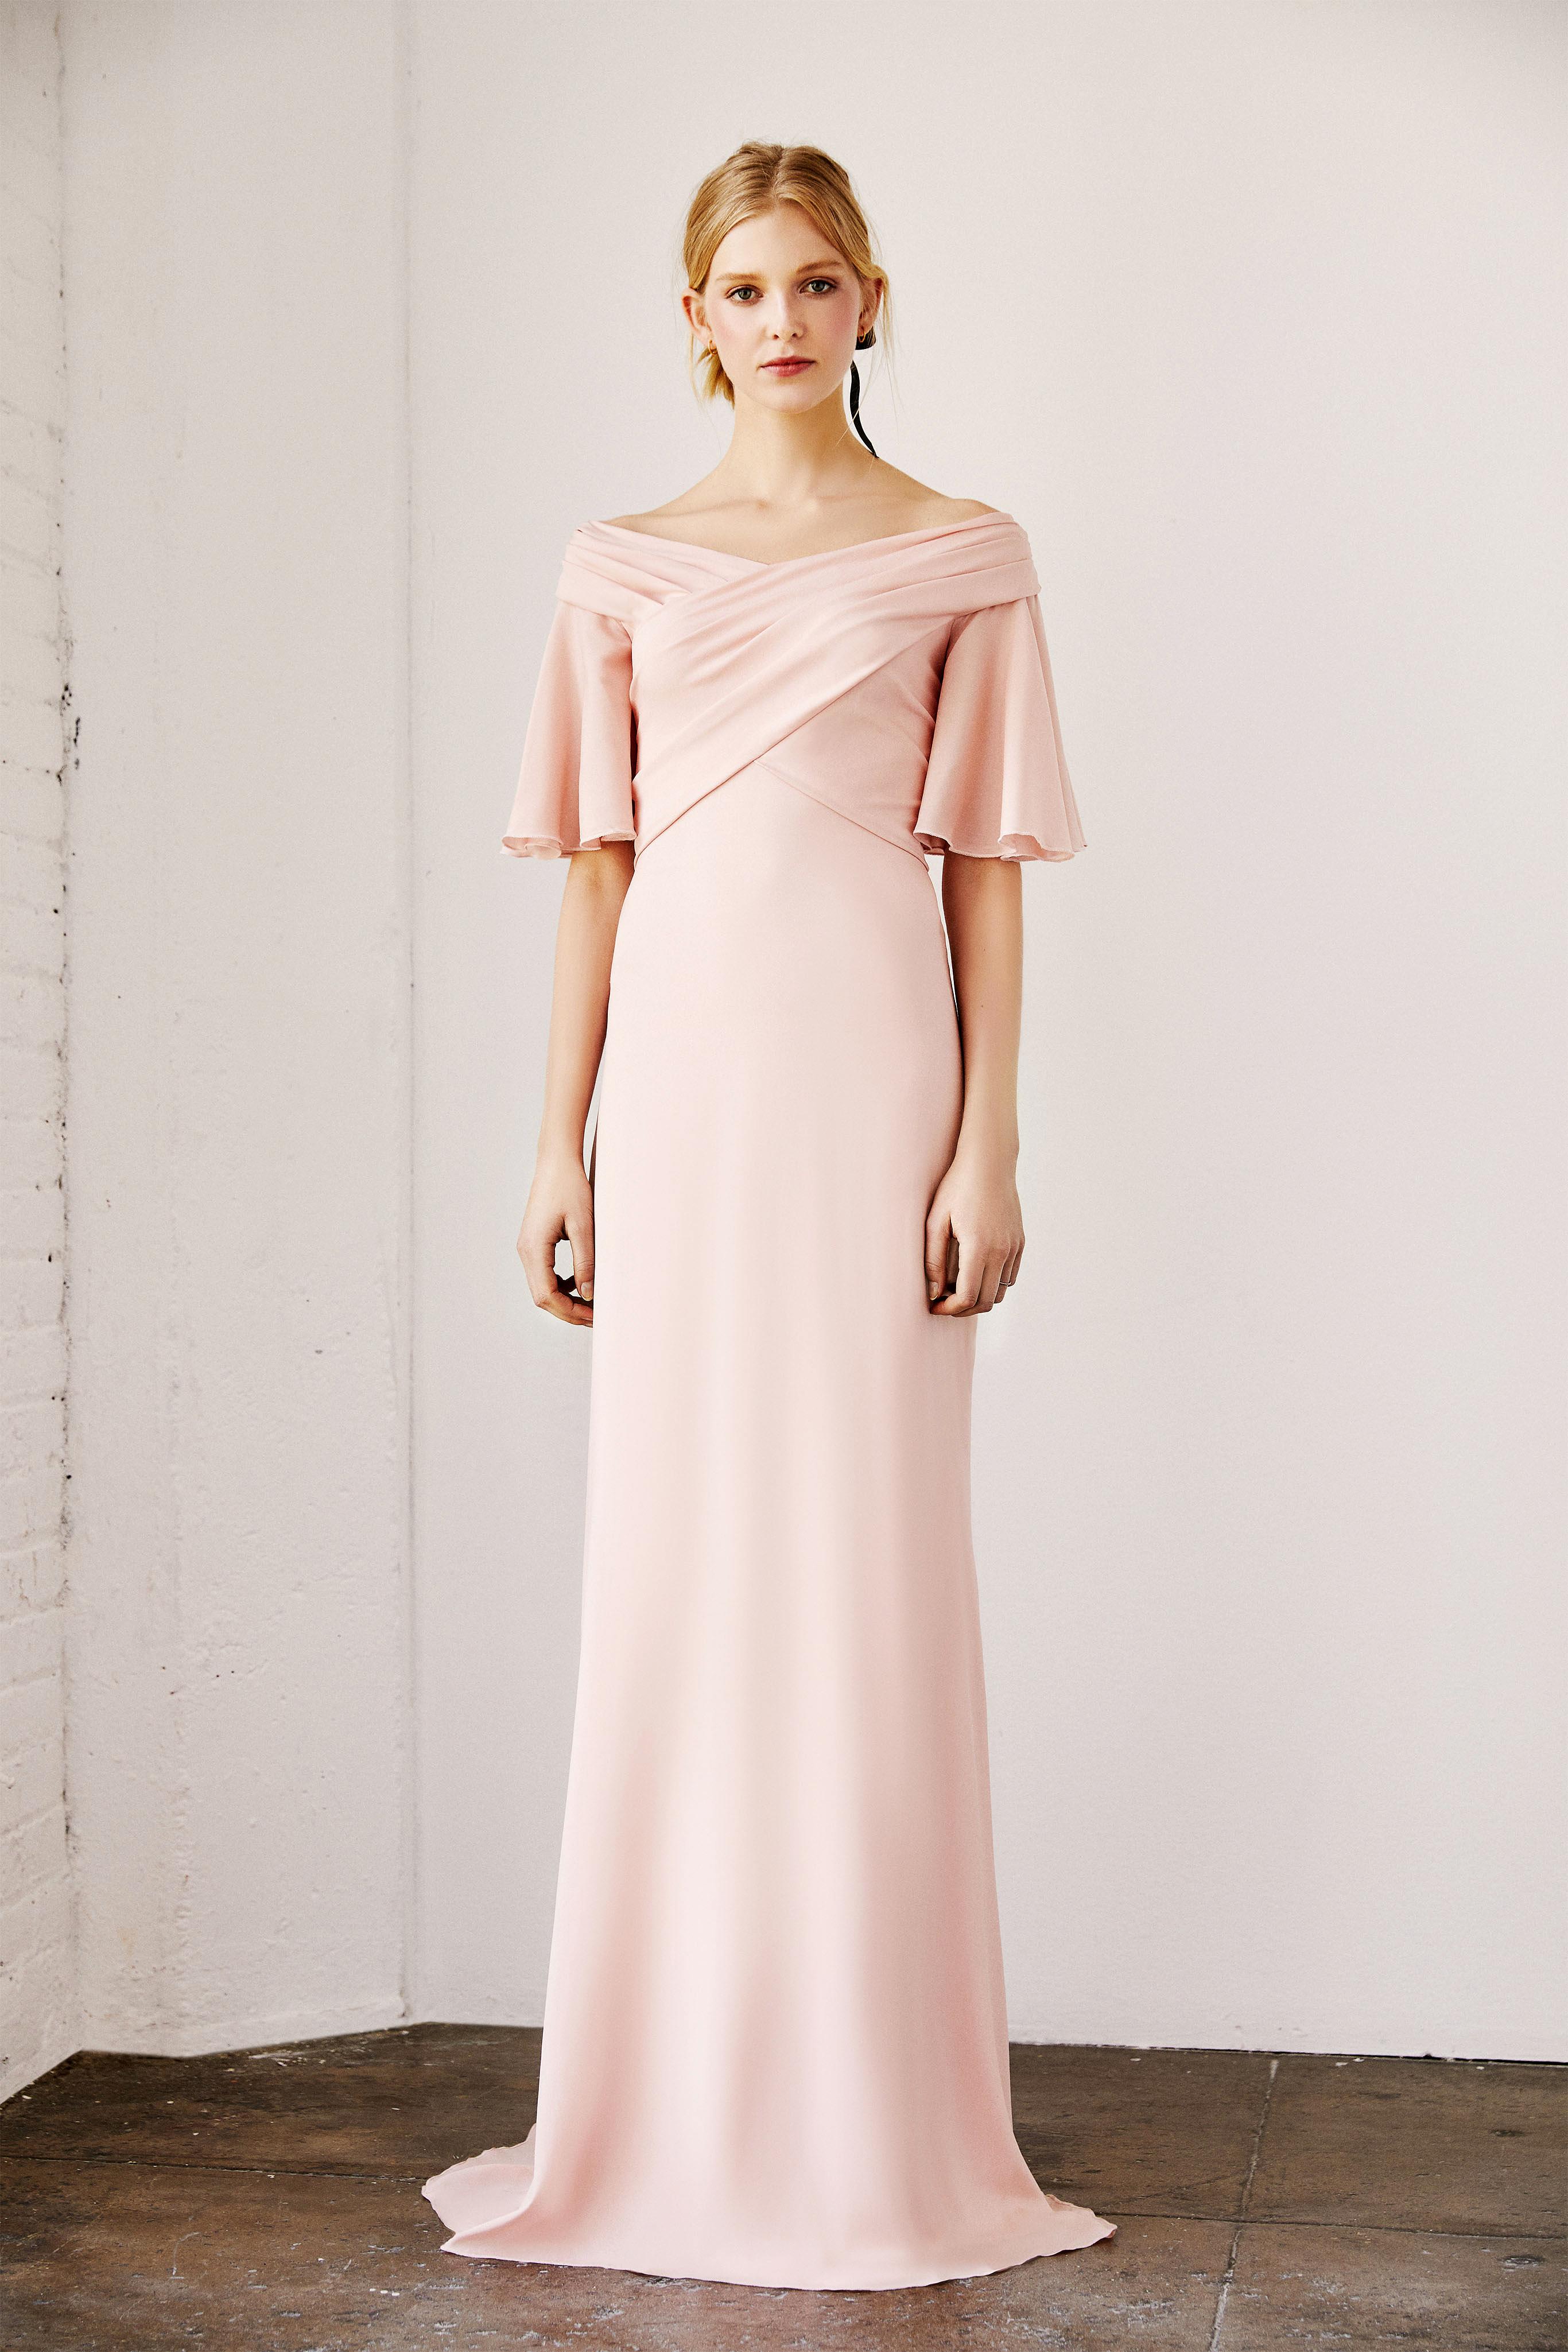 tadashi shoji wedding dress spring 2019 pink elbow length sleeves column